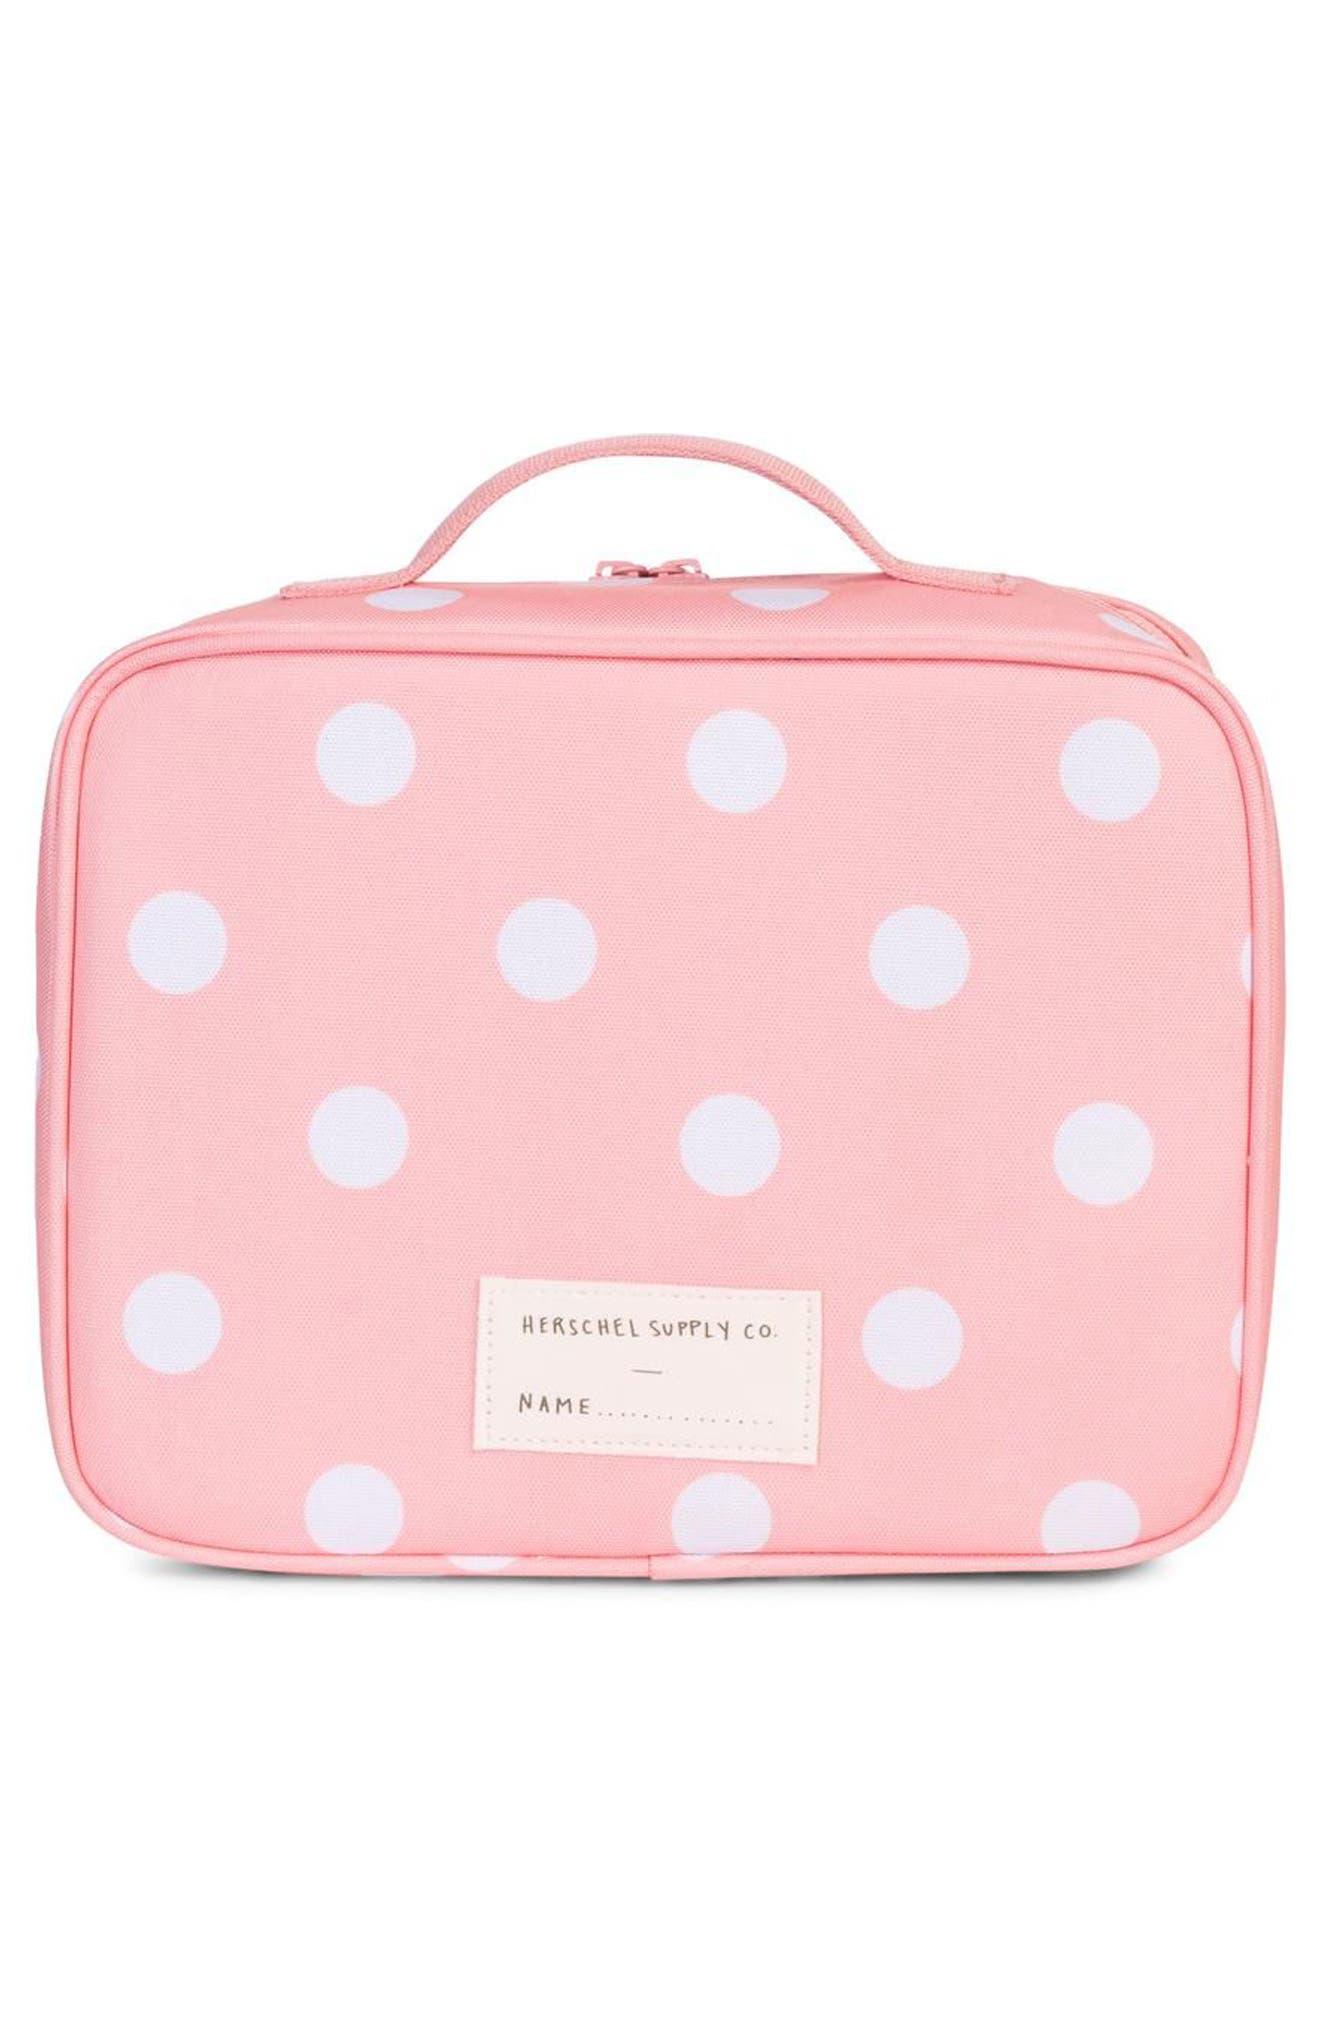 Pop Quiz Lunchbox,                             Alternate thumbnail 2, color,                             Peach Polka Dot/ Peacoat